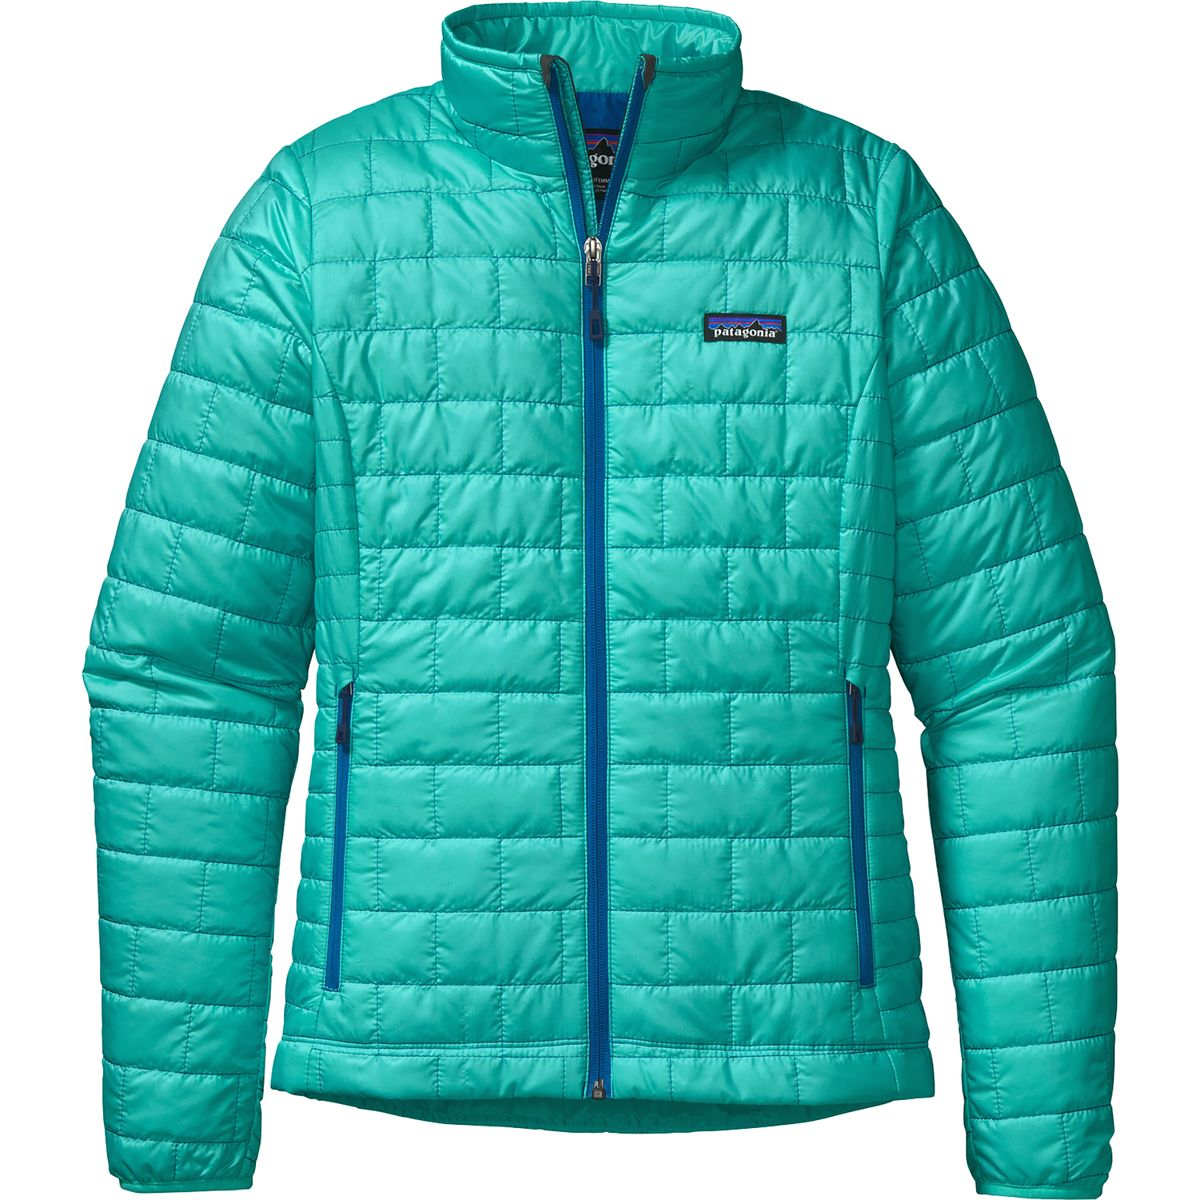 Patagonia Nano Puff Insulated Jacket - Women